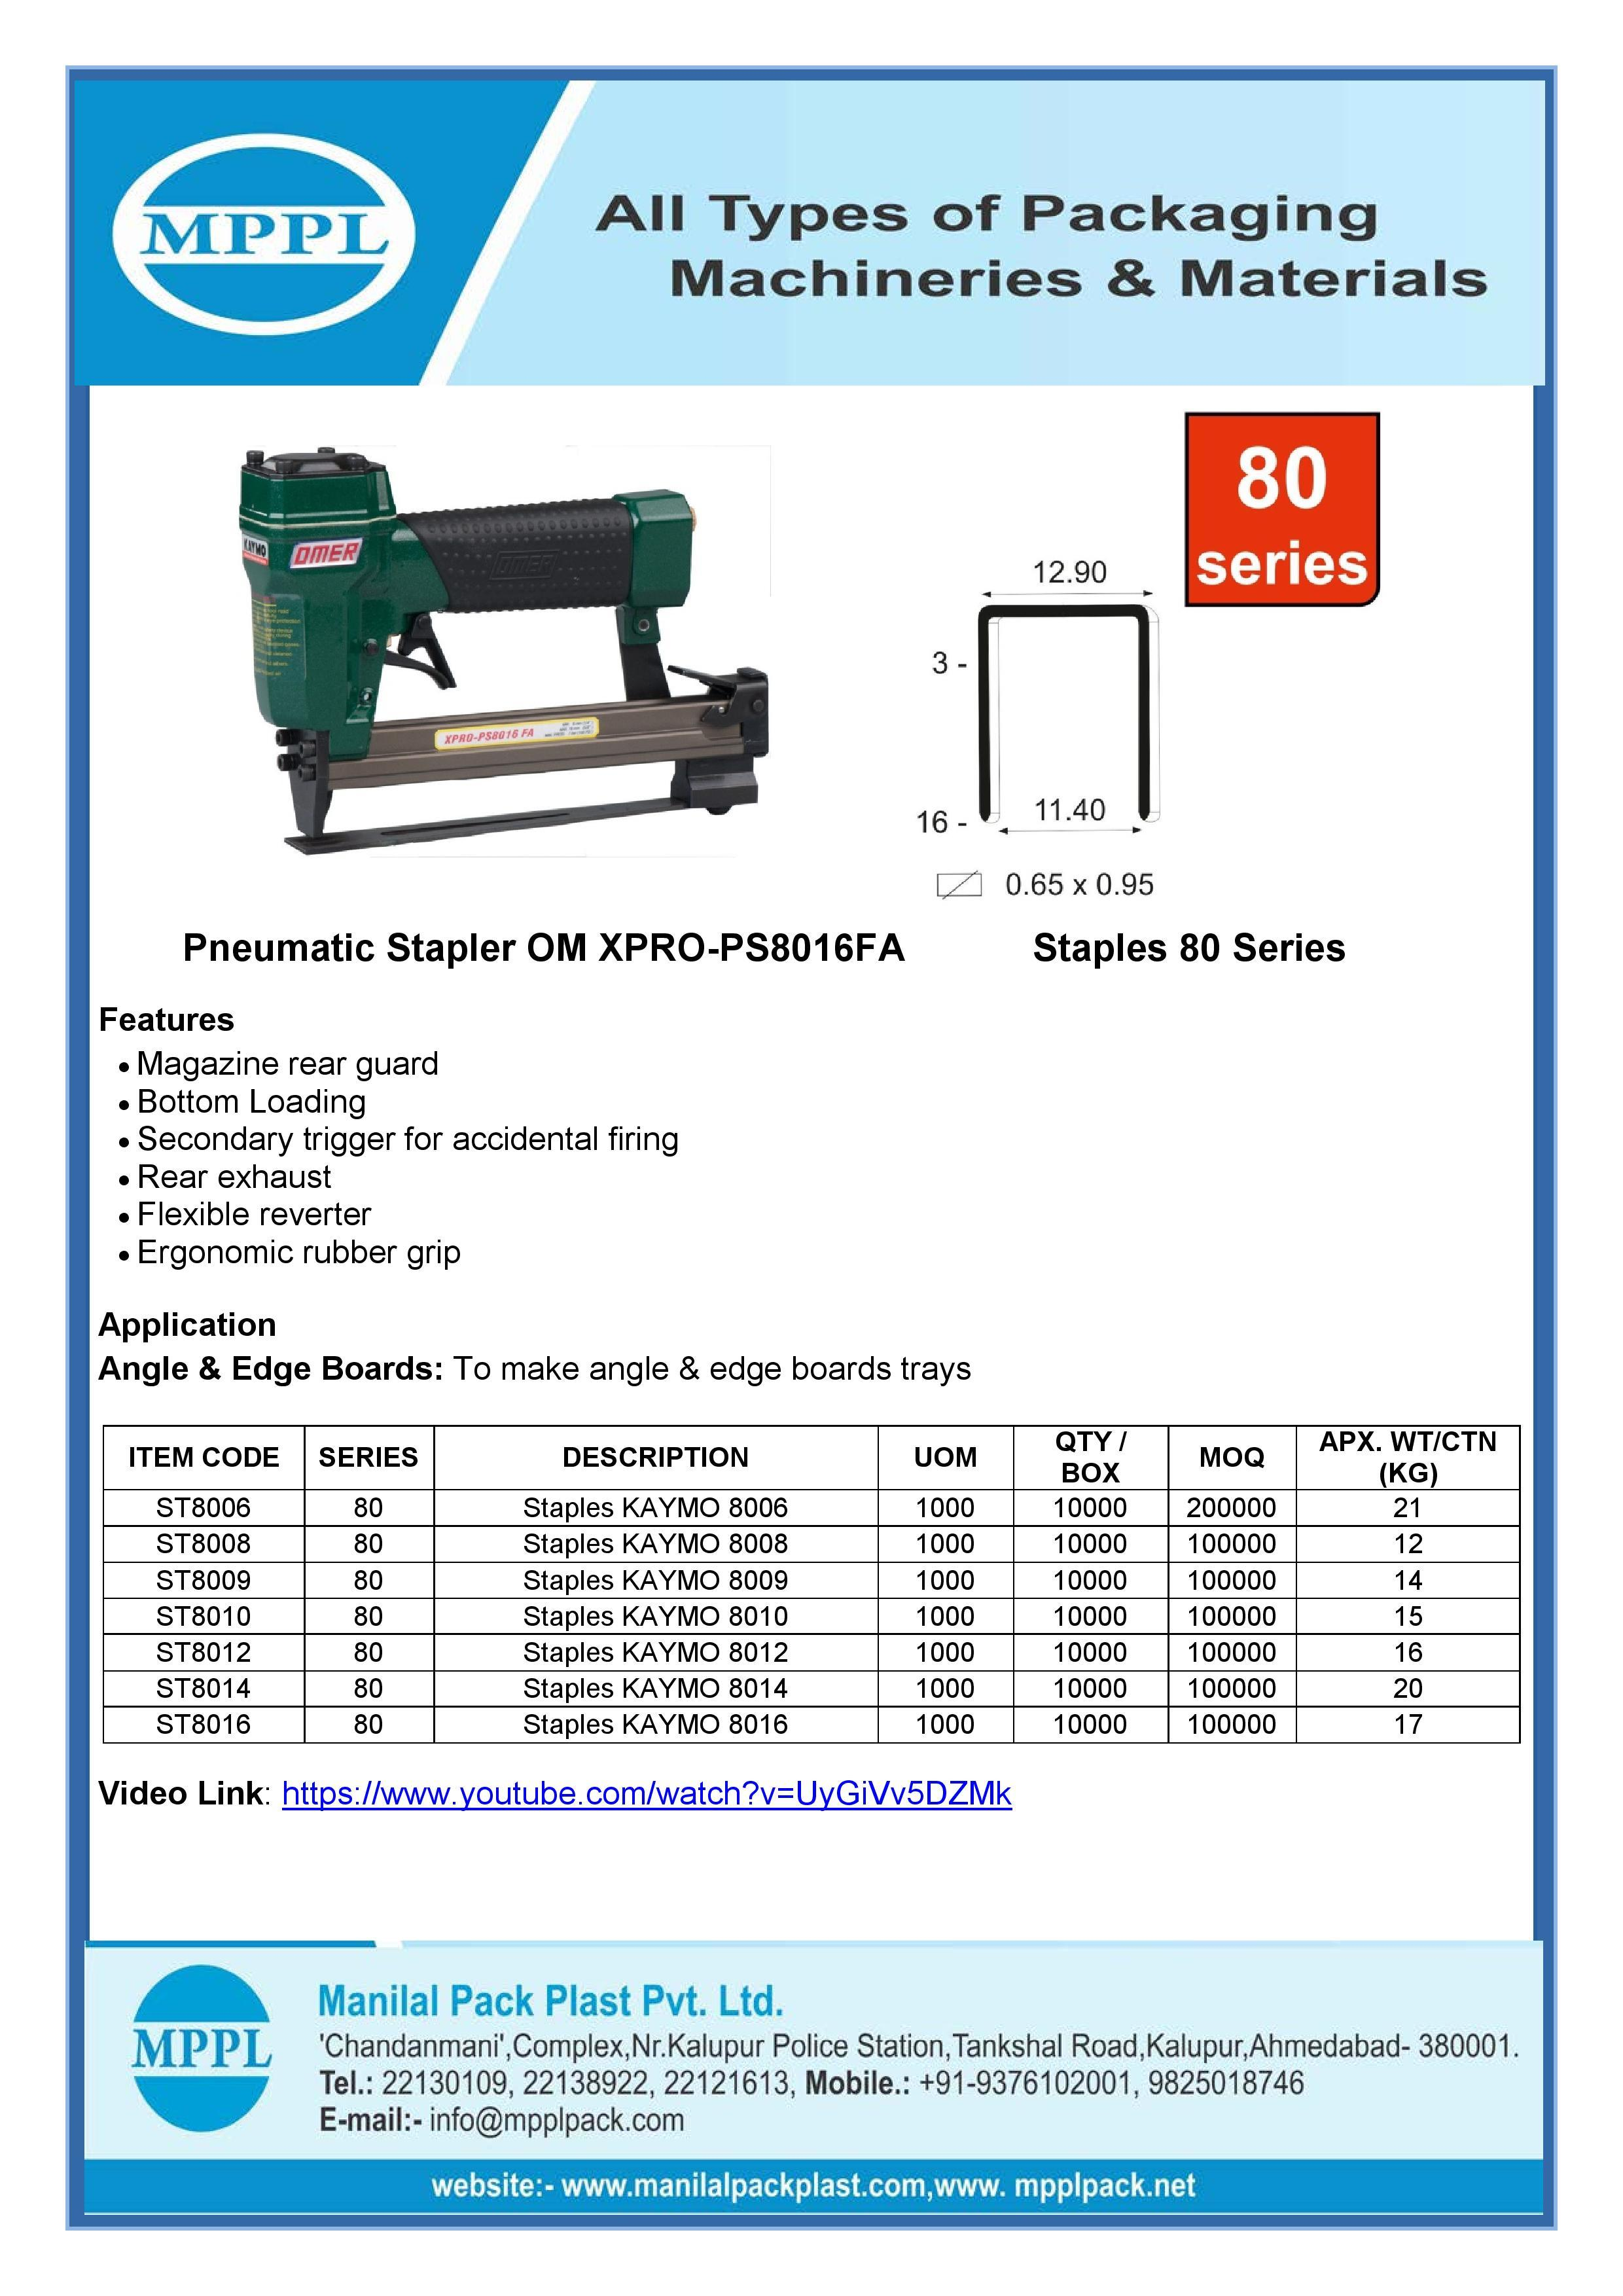 Pneumatic Stapler OM XPRO-PS8016FA